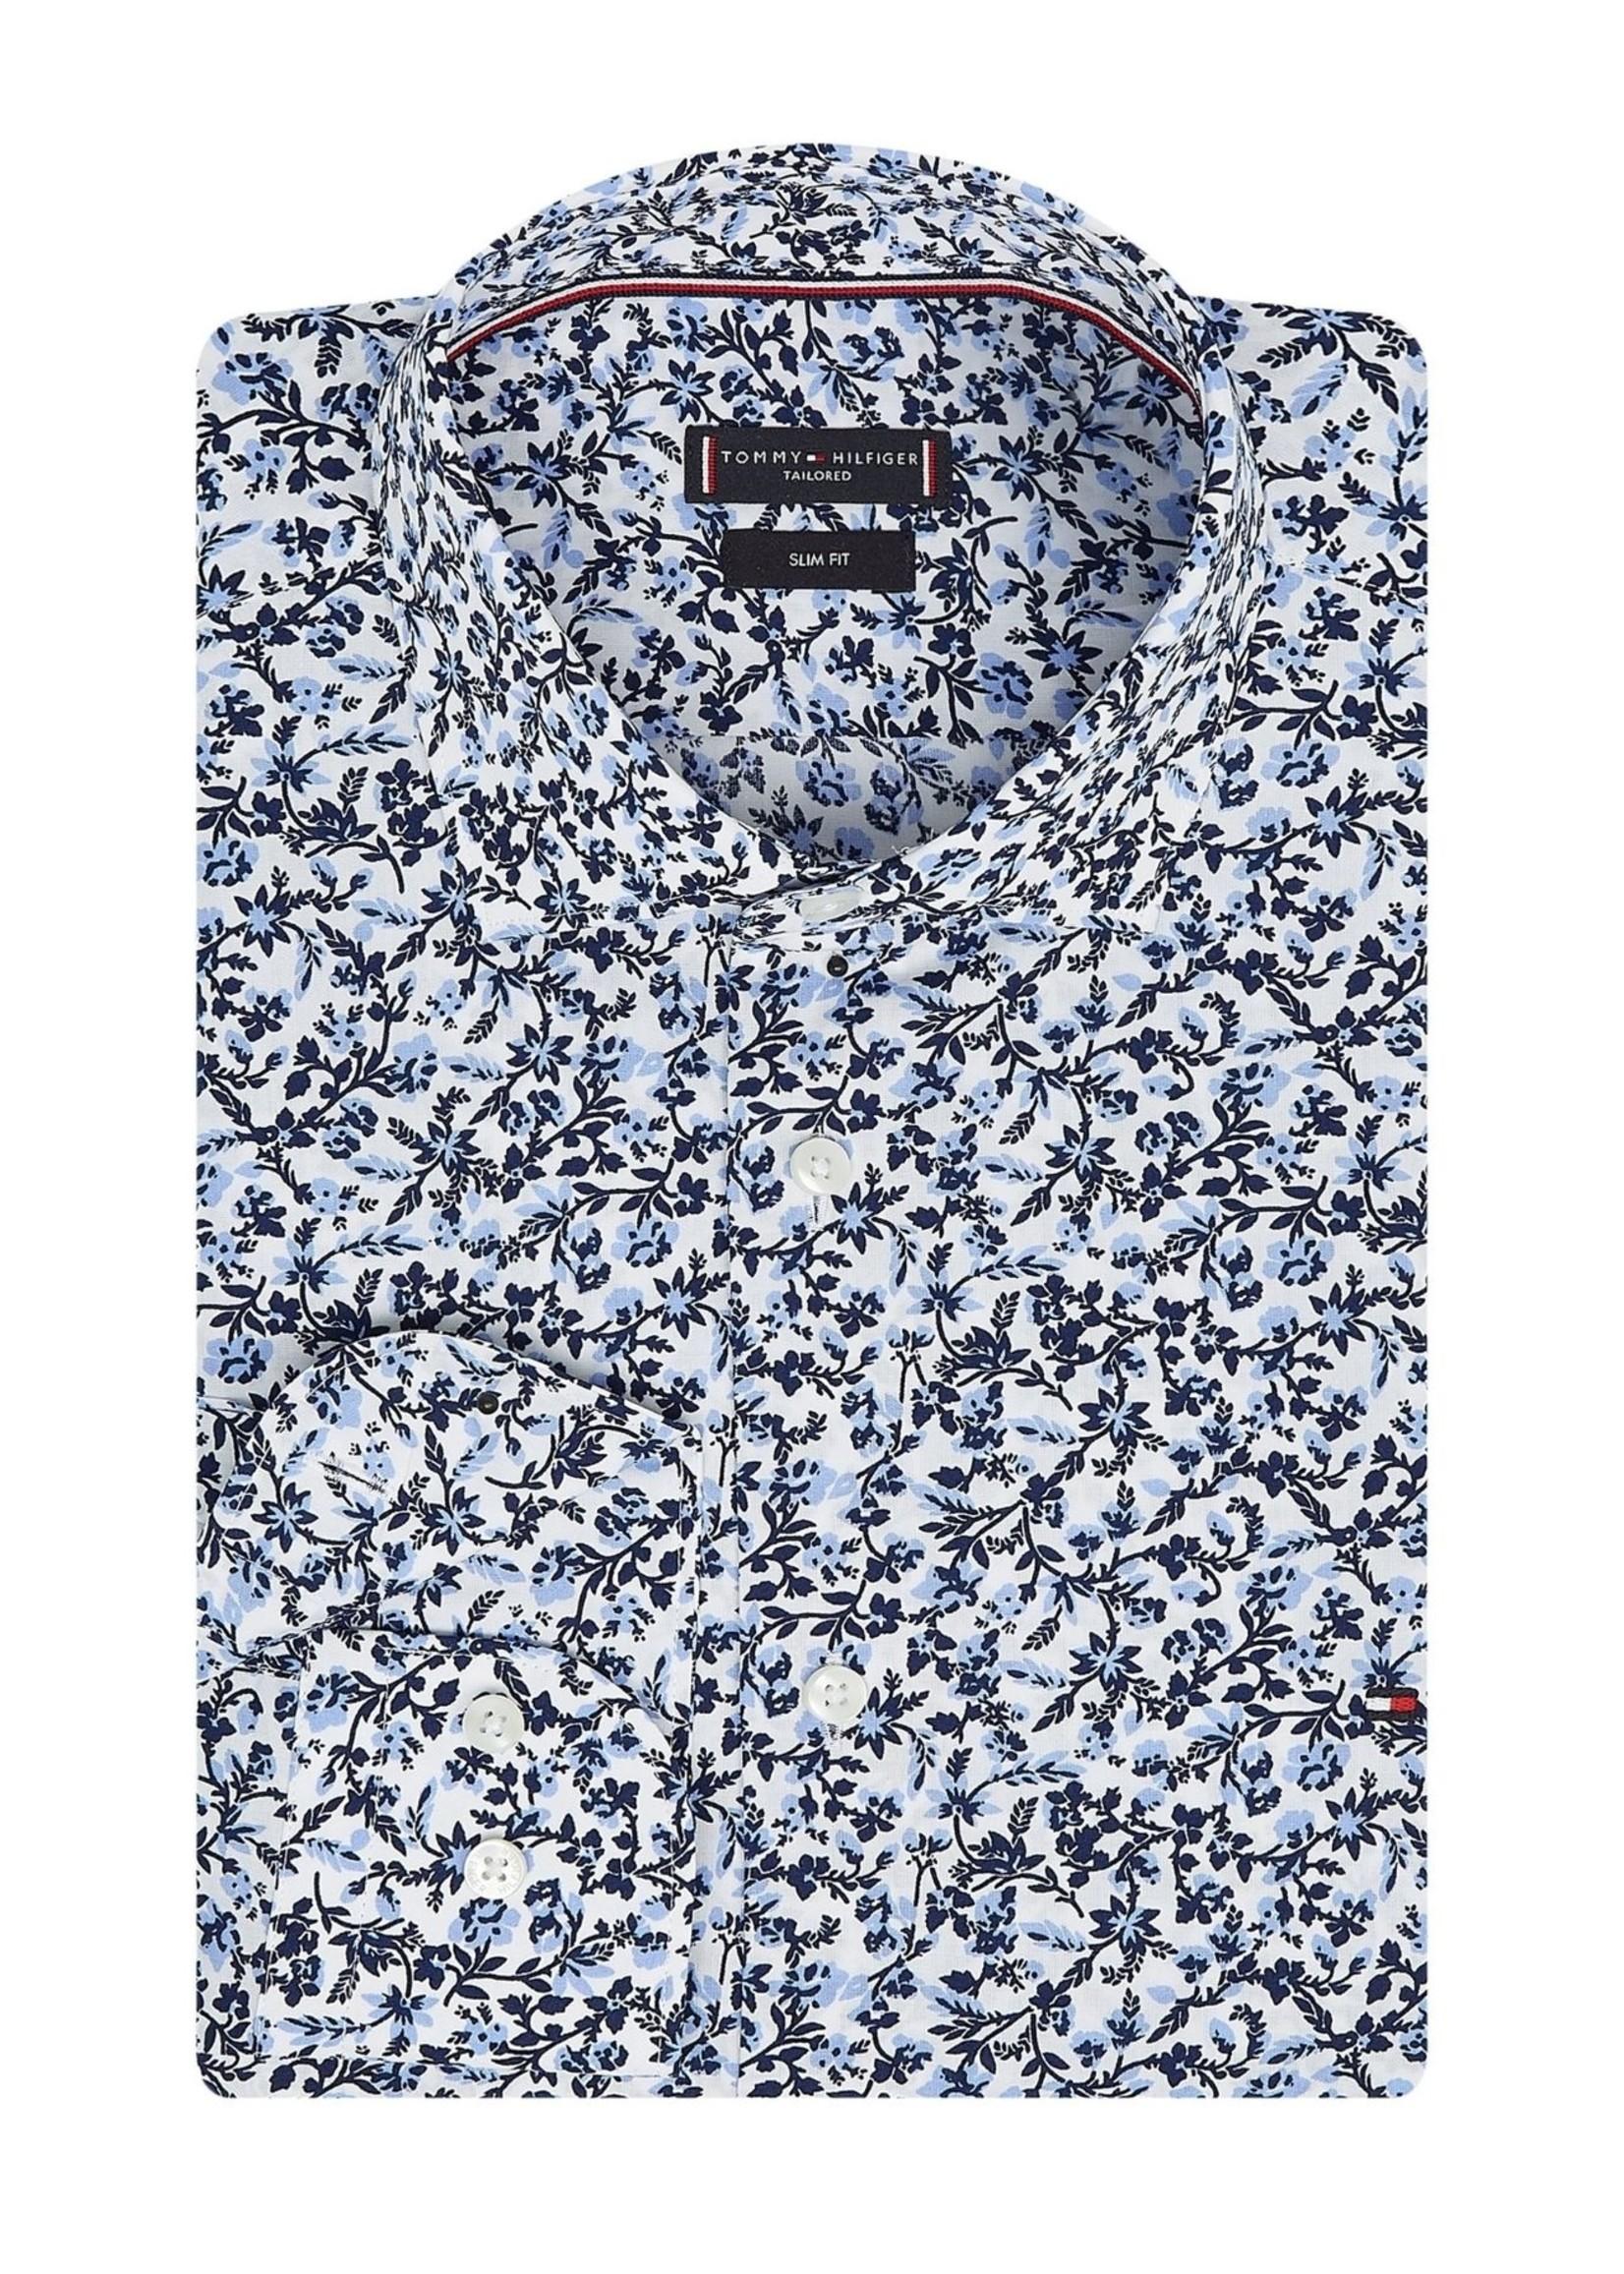 Tommy Hilfiger Large Floral Print Slim Shirt | Bleu clair/Blanc/Marine | Tommy Hilfiger